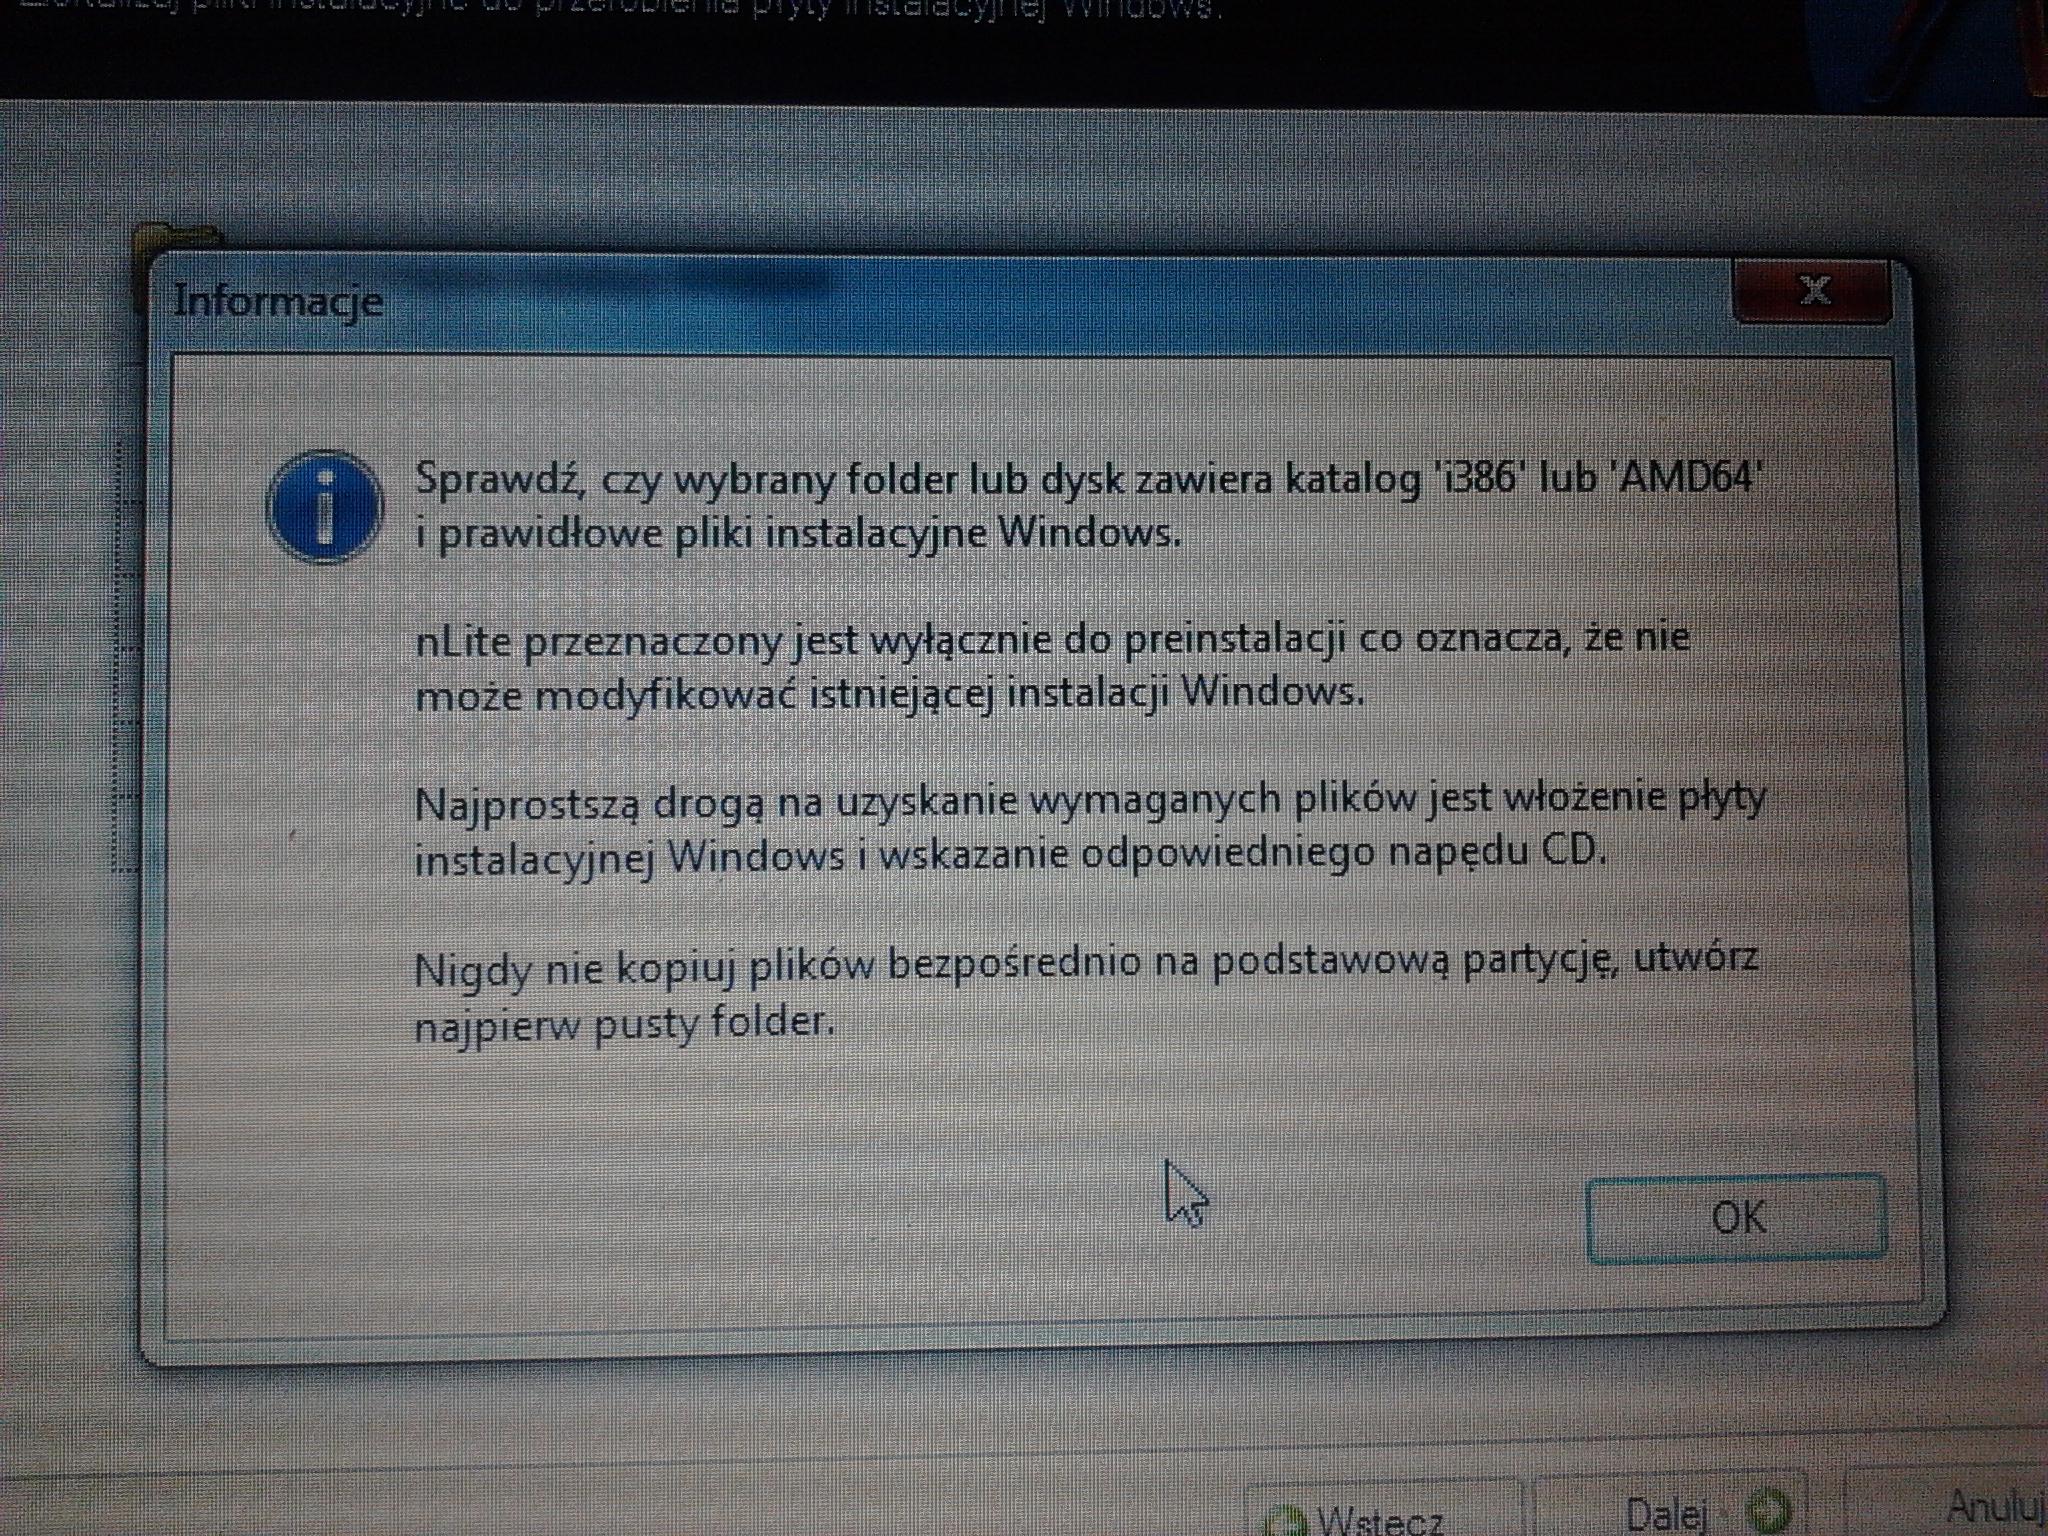 Problem instalacja windows xp dell gx280 stop:0x0000007B